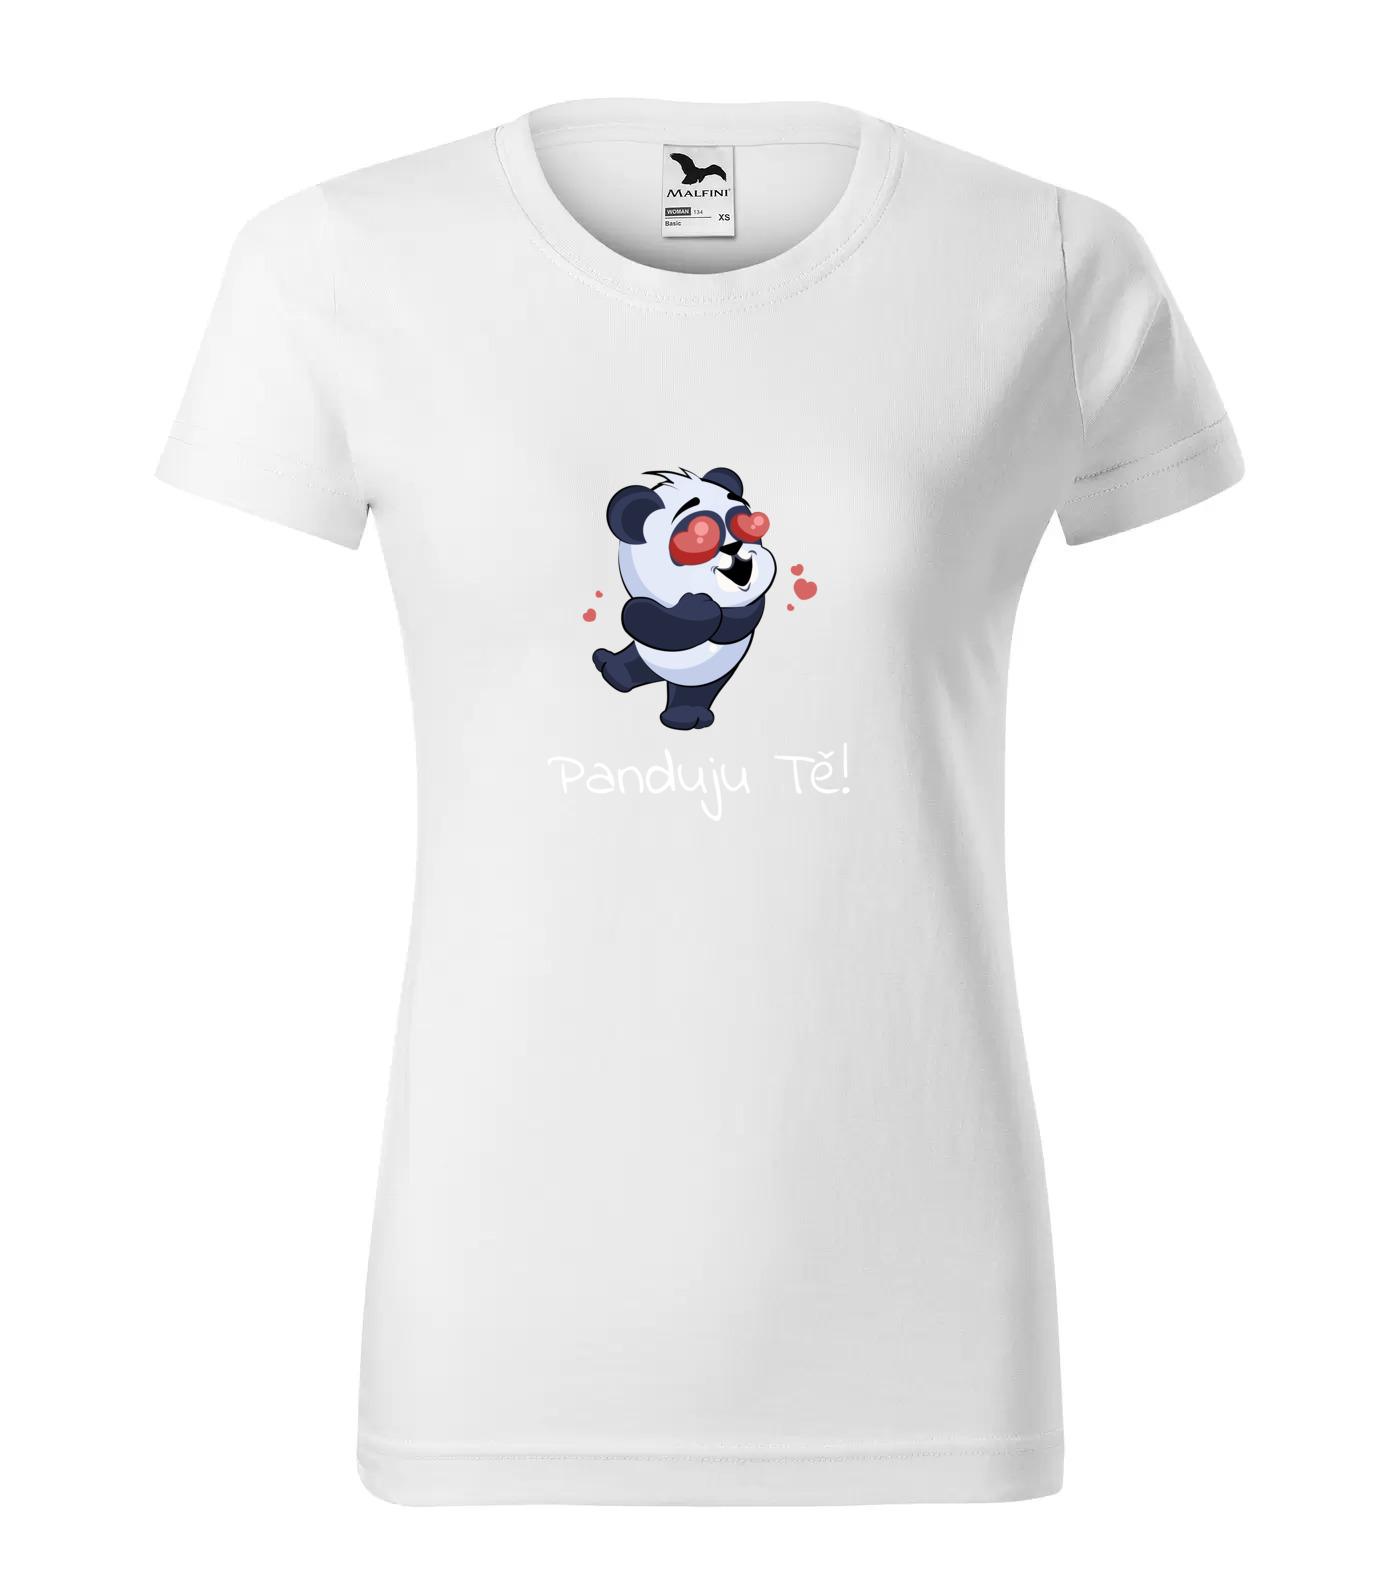 Tričko Panda Panduju Tě (bílý nápis)